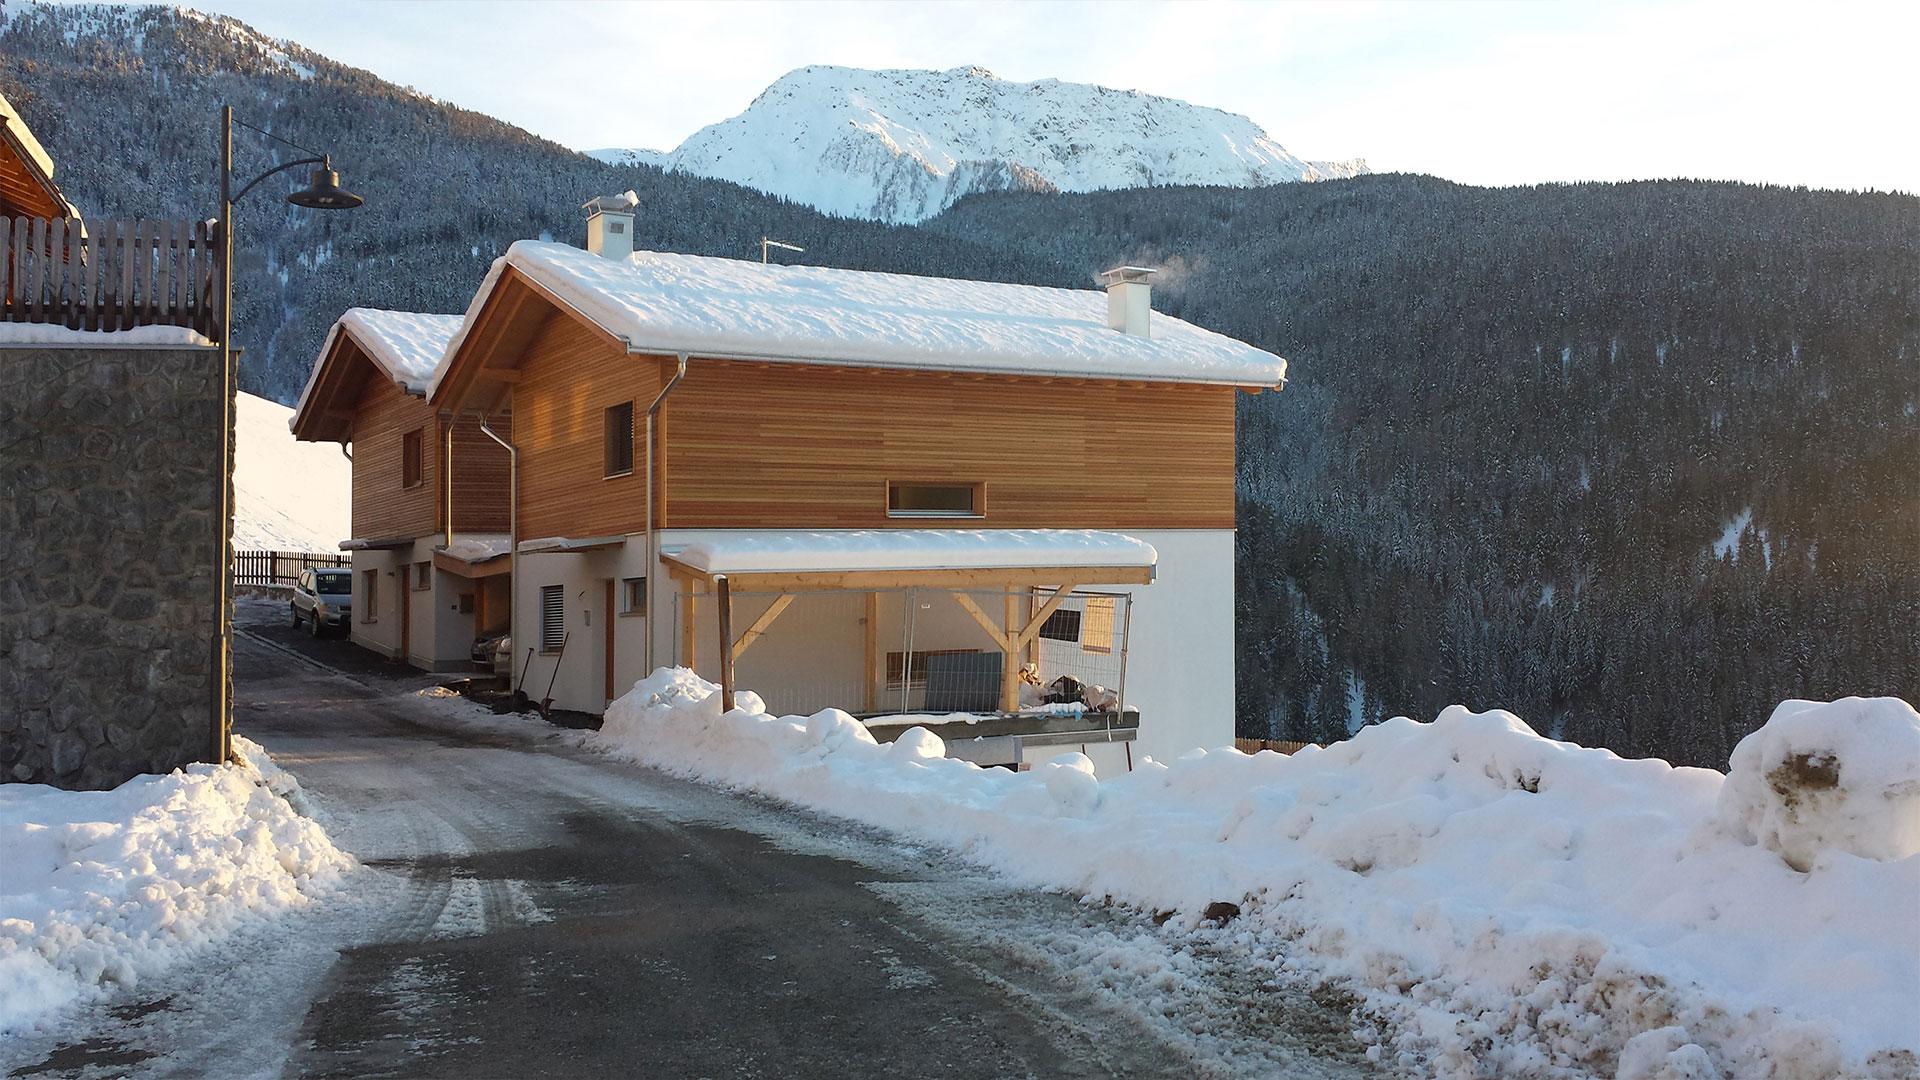 Casa singola in montagna a San Martino in Valdurna, Bolzano